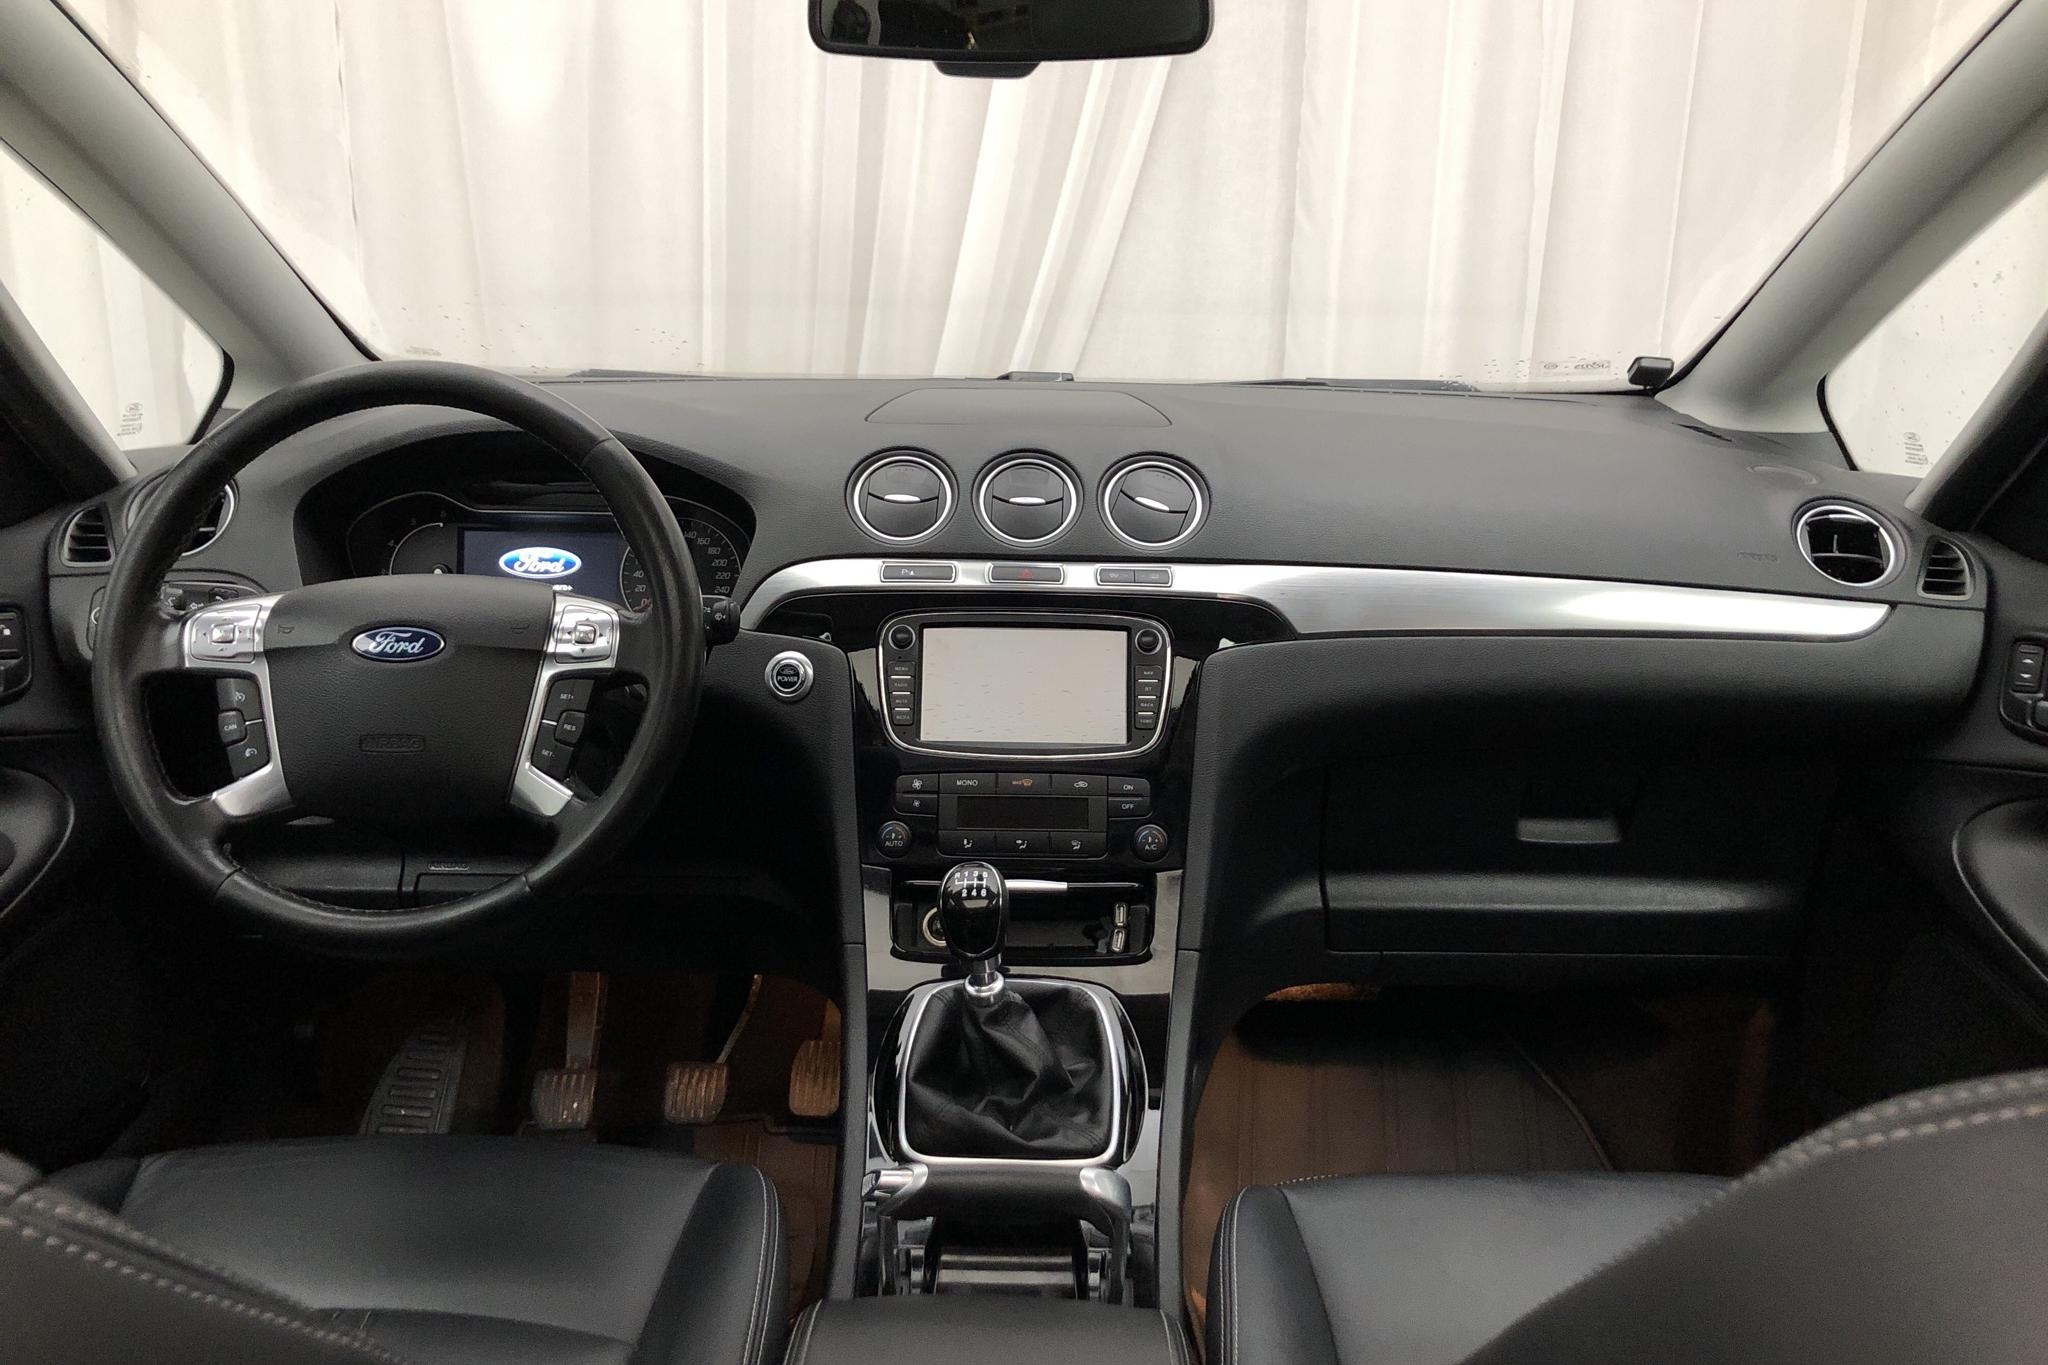 Ford S-MAX 2.0 Duratorq TDCi (140hk) - 225 240 km - Manual - white - 2012